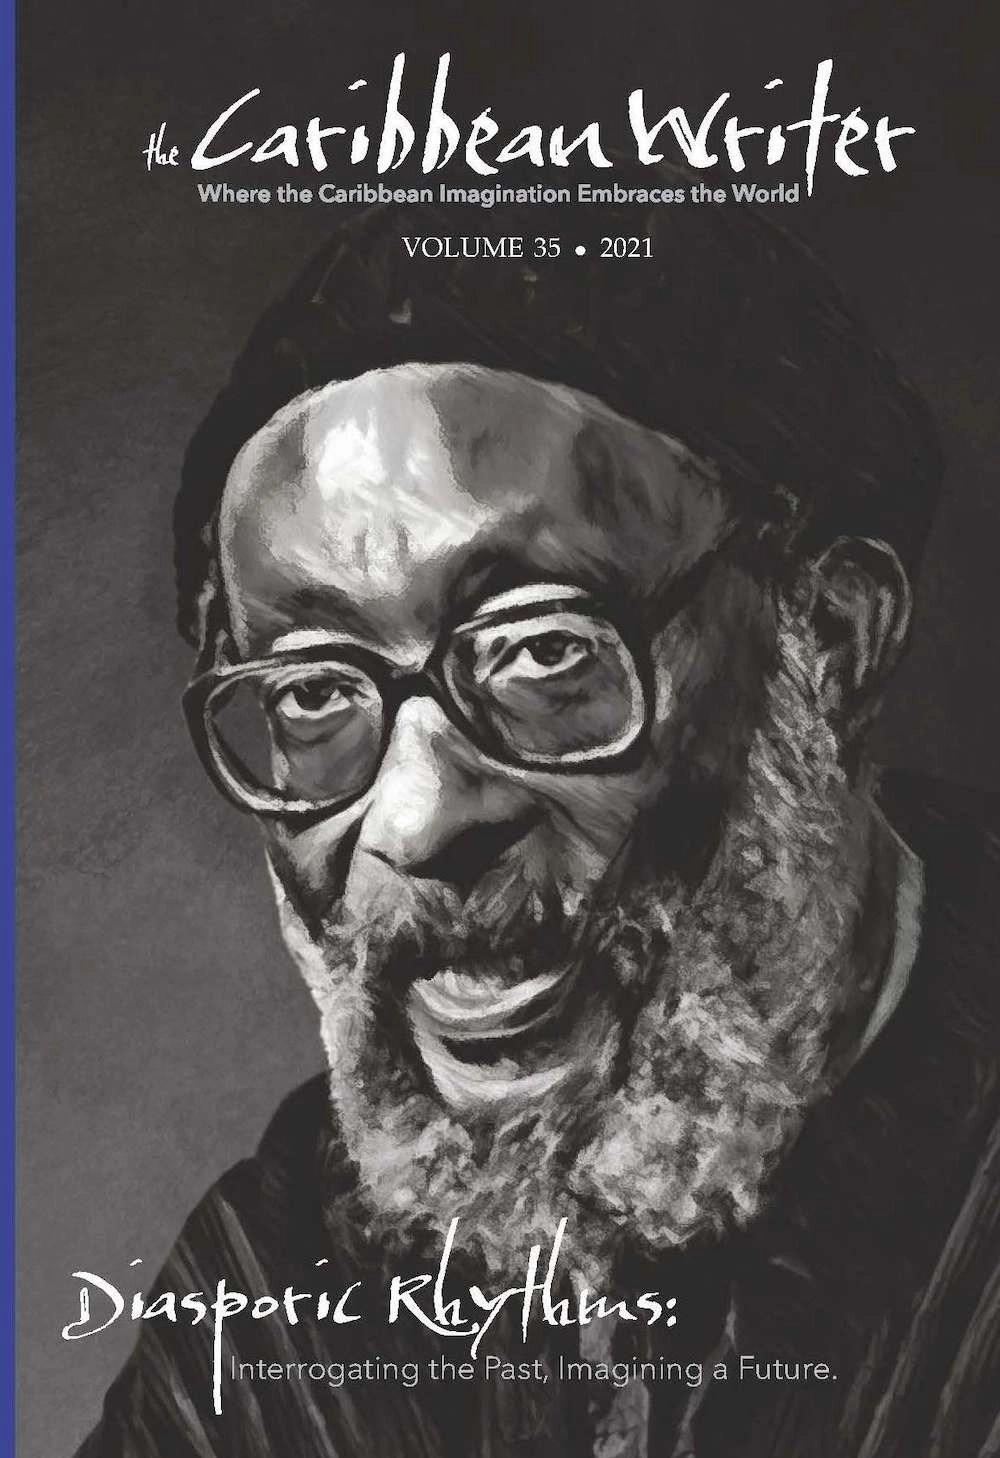 TCW Vol. 35 Cover